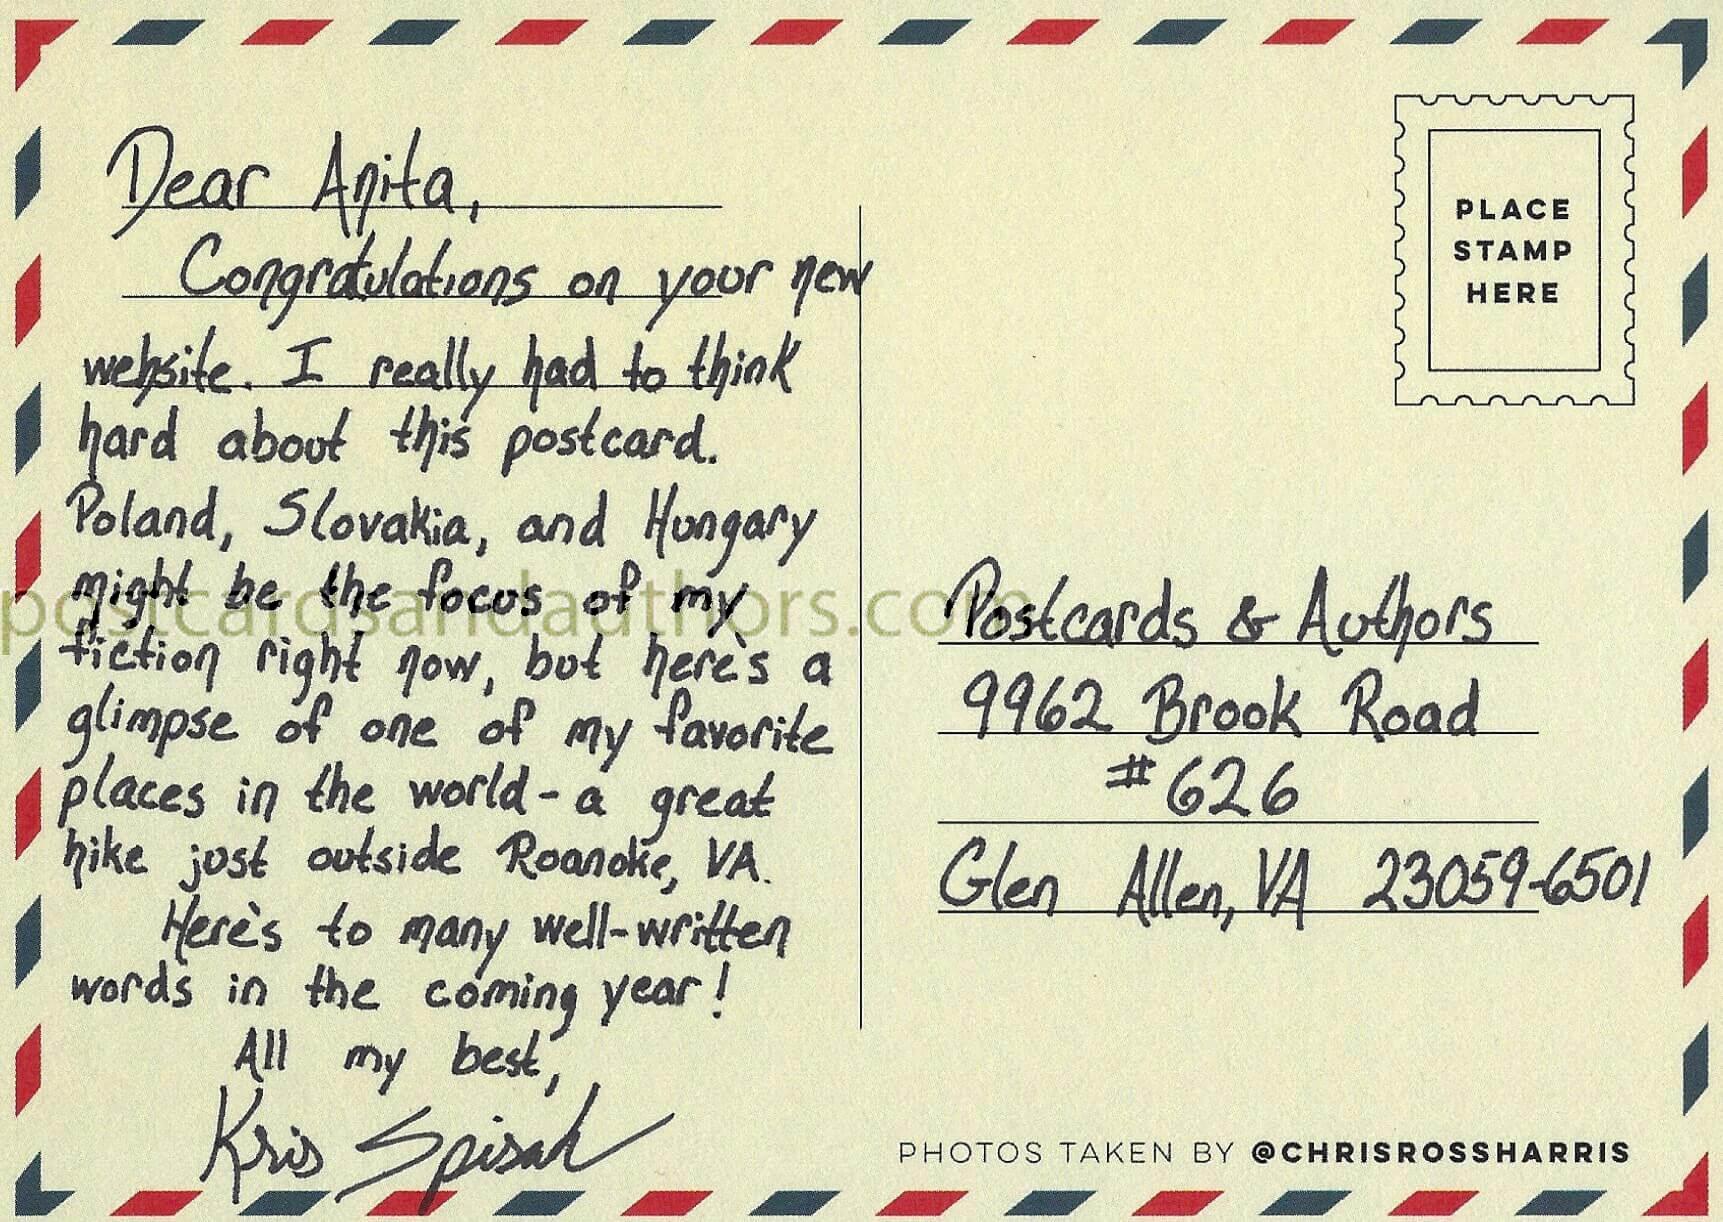 Kris Spisak postcard